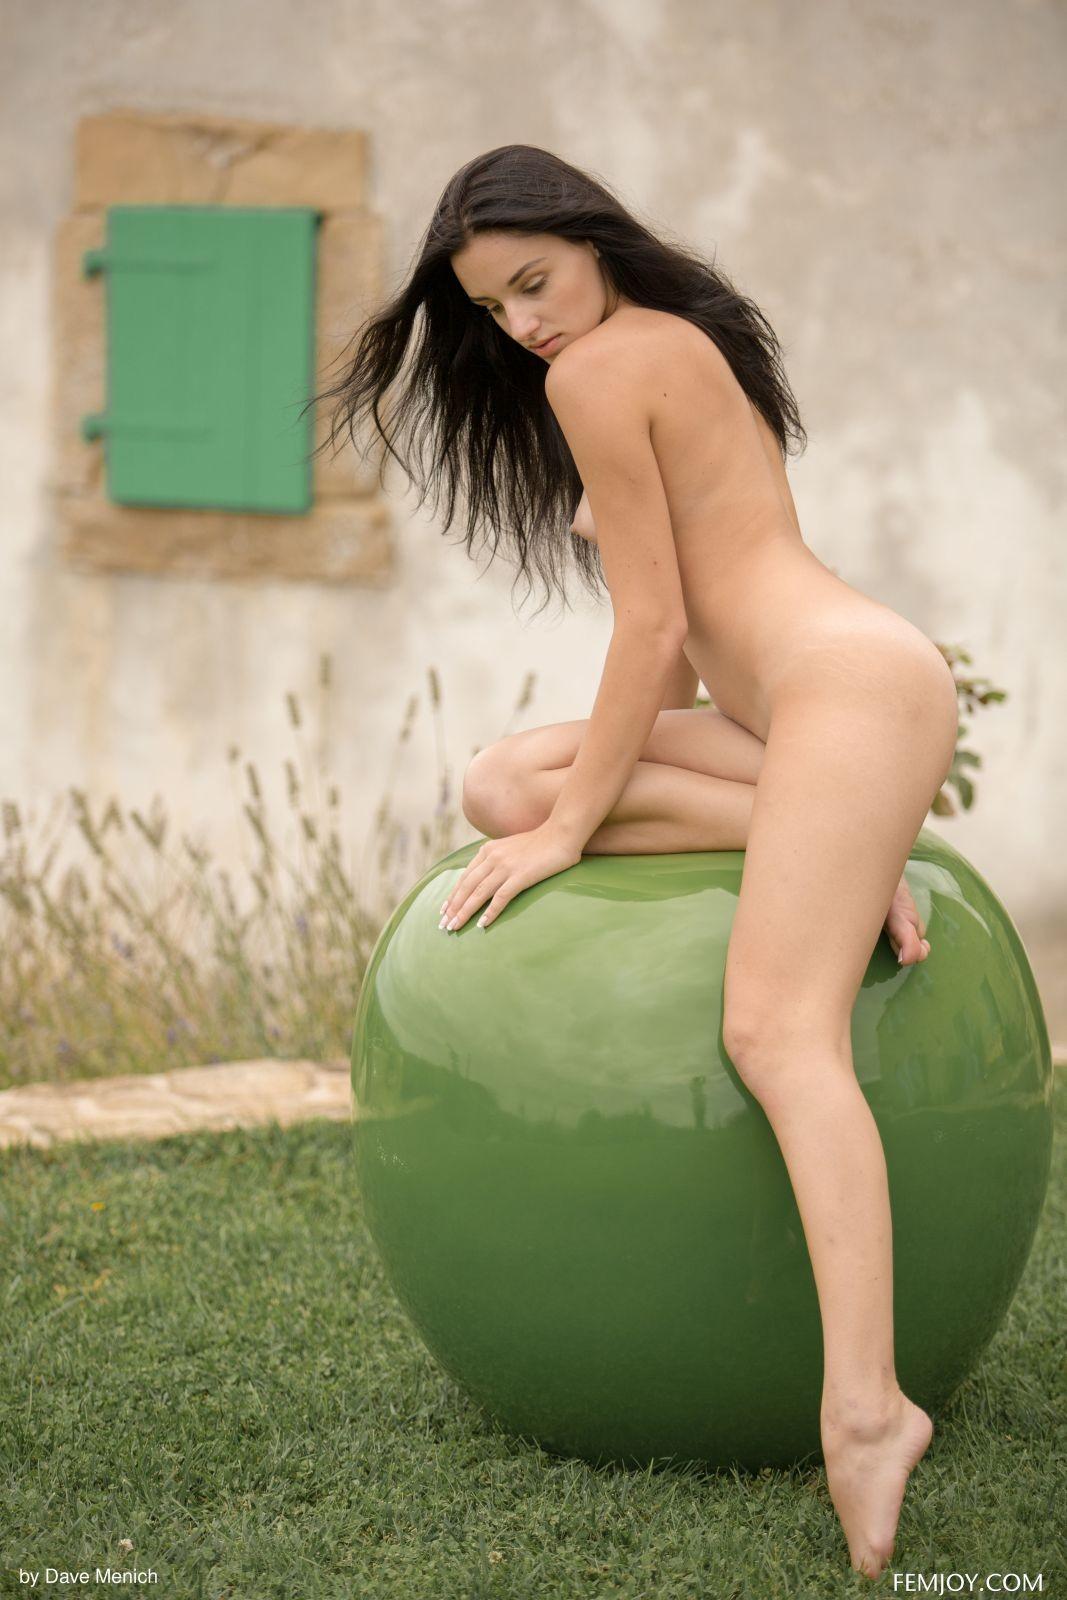 Голая красотка на травке - фото